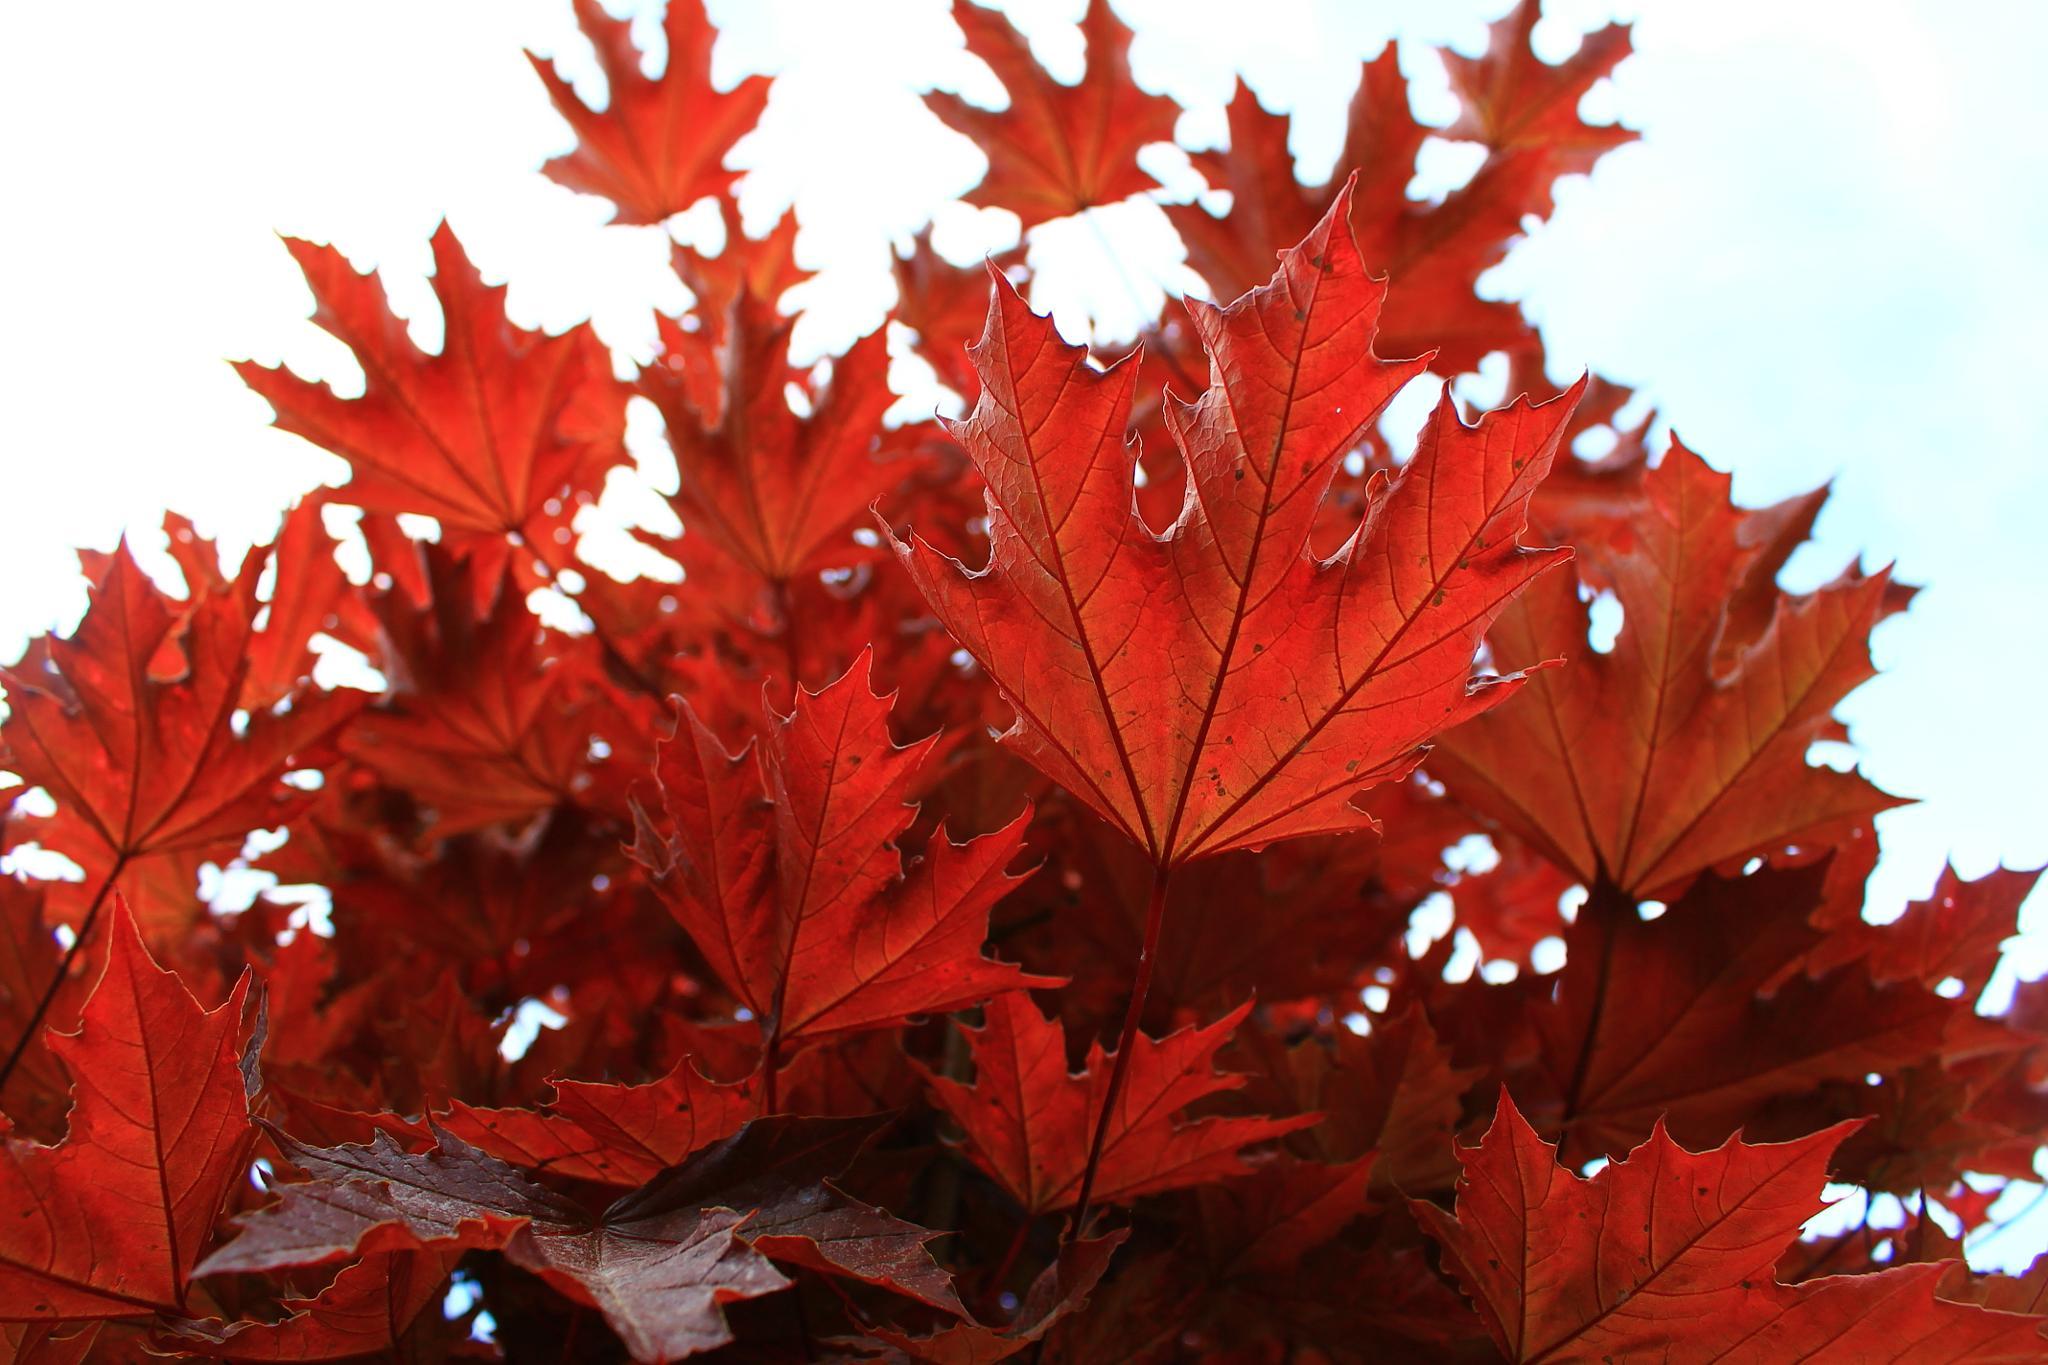 Red Leaves by Pontus Hübner